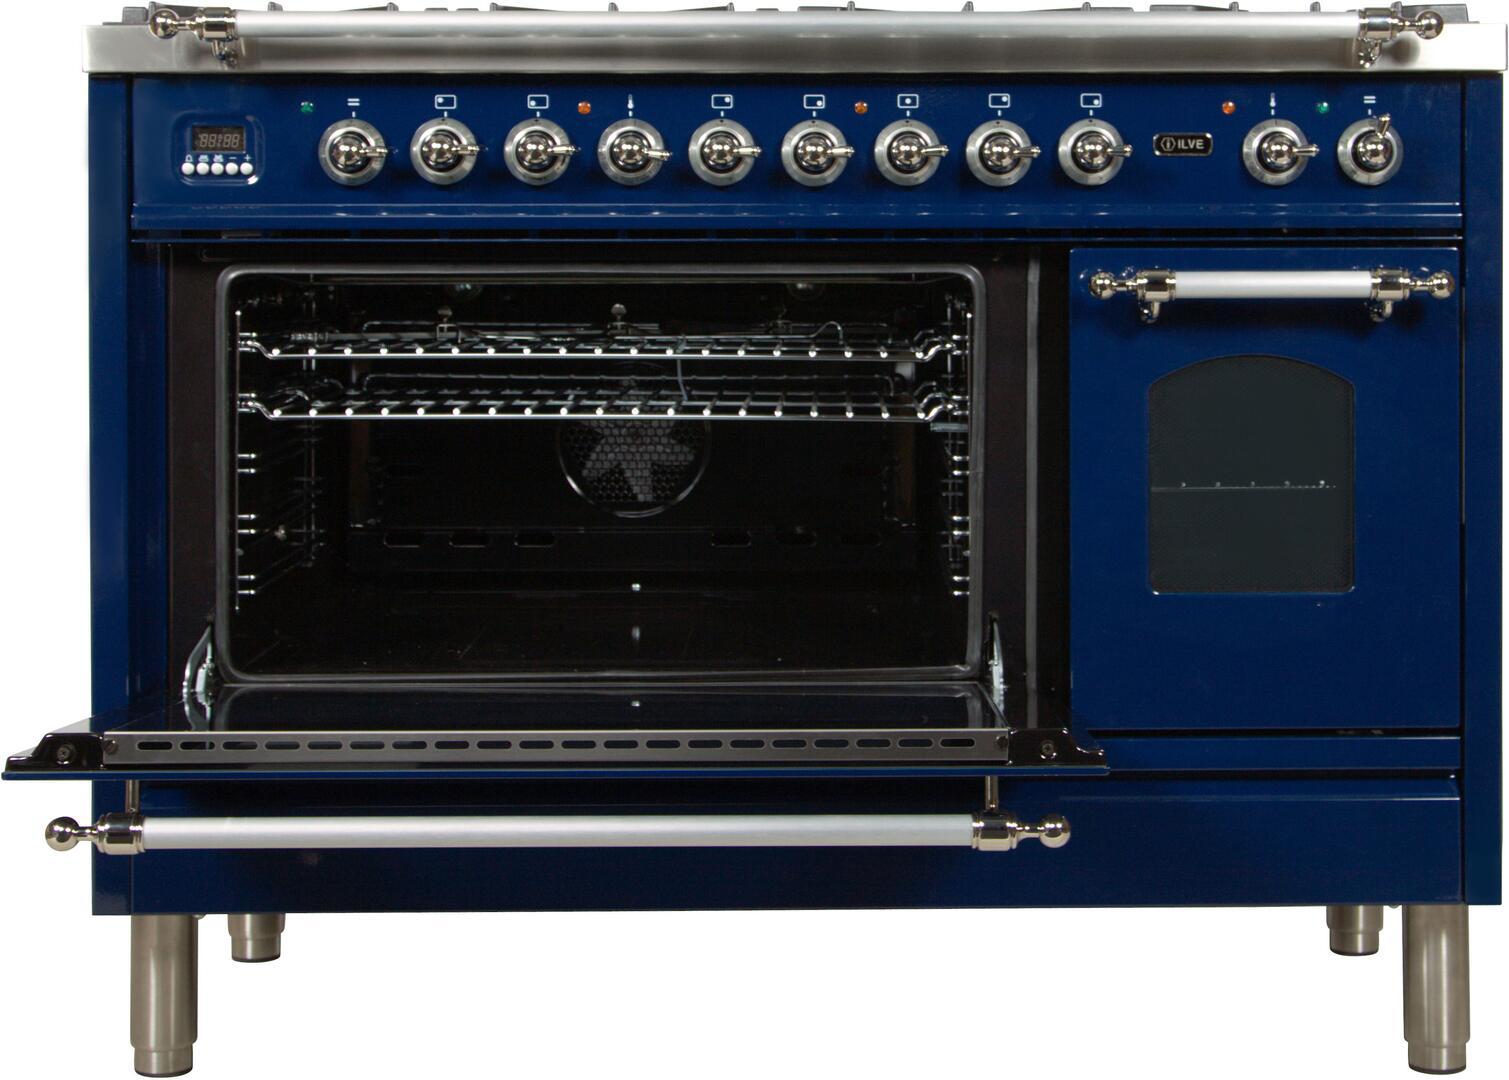 Ilve Nostalgie UPN120FDMPBLX Freestanding Dual Fuel Range Blue, UPN120FDMPBLX Main Oven Door Opened